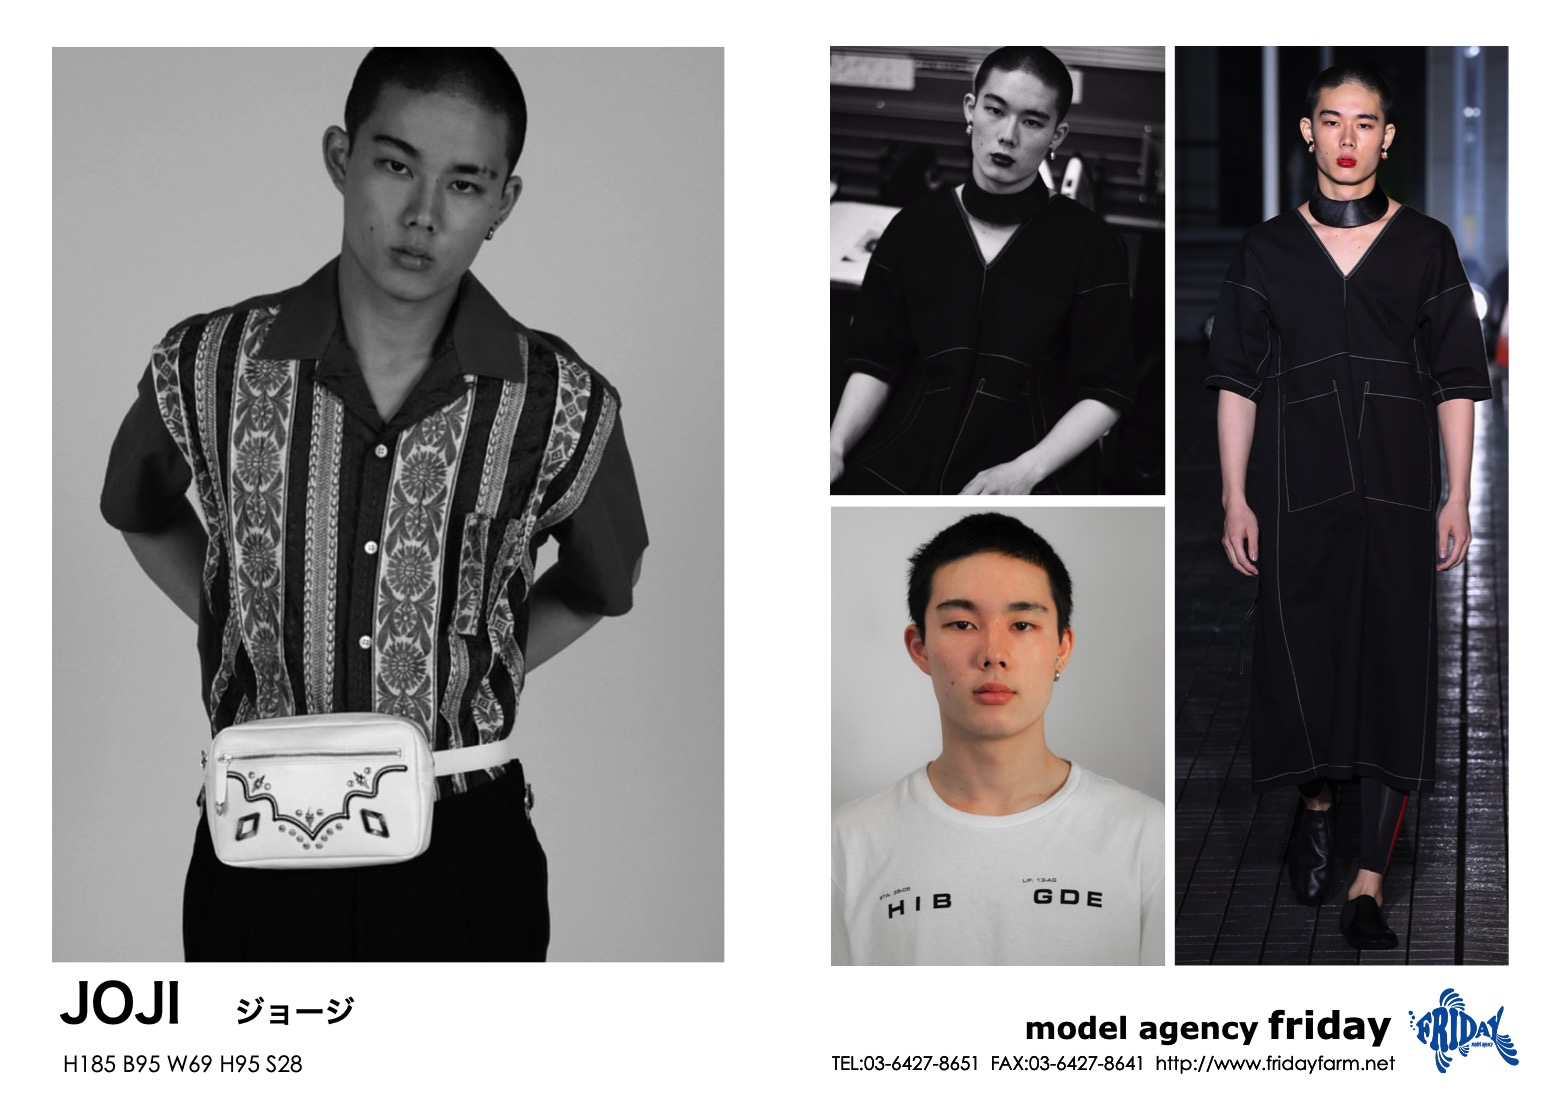 JOJI - ジョージ | model agency friday